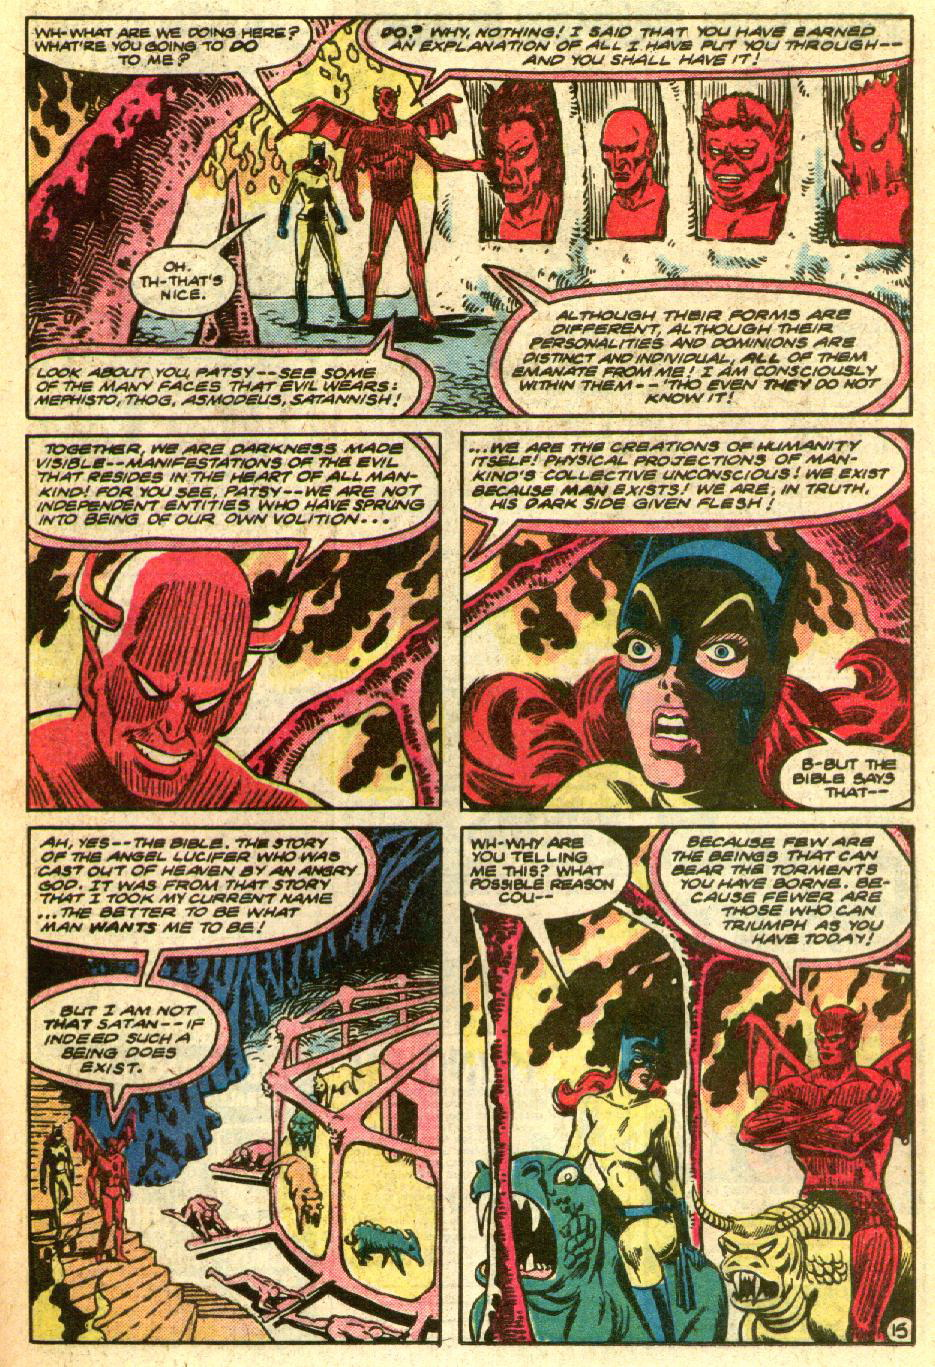 Marvel美漫世界觀裡的強者(一) ~ 美漫X閒聊